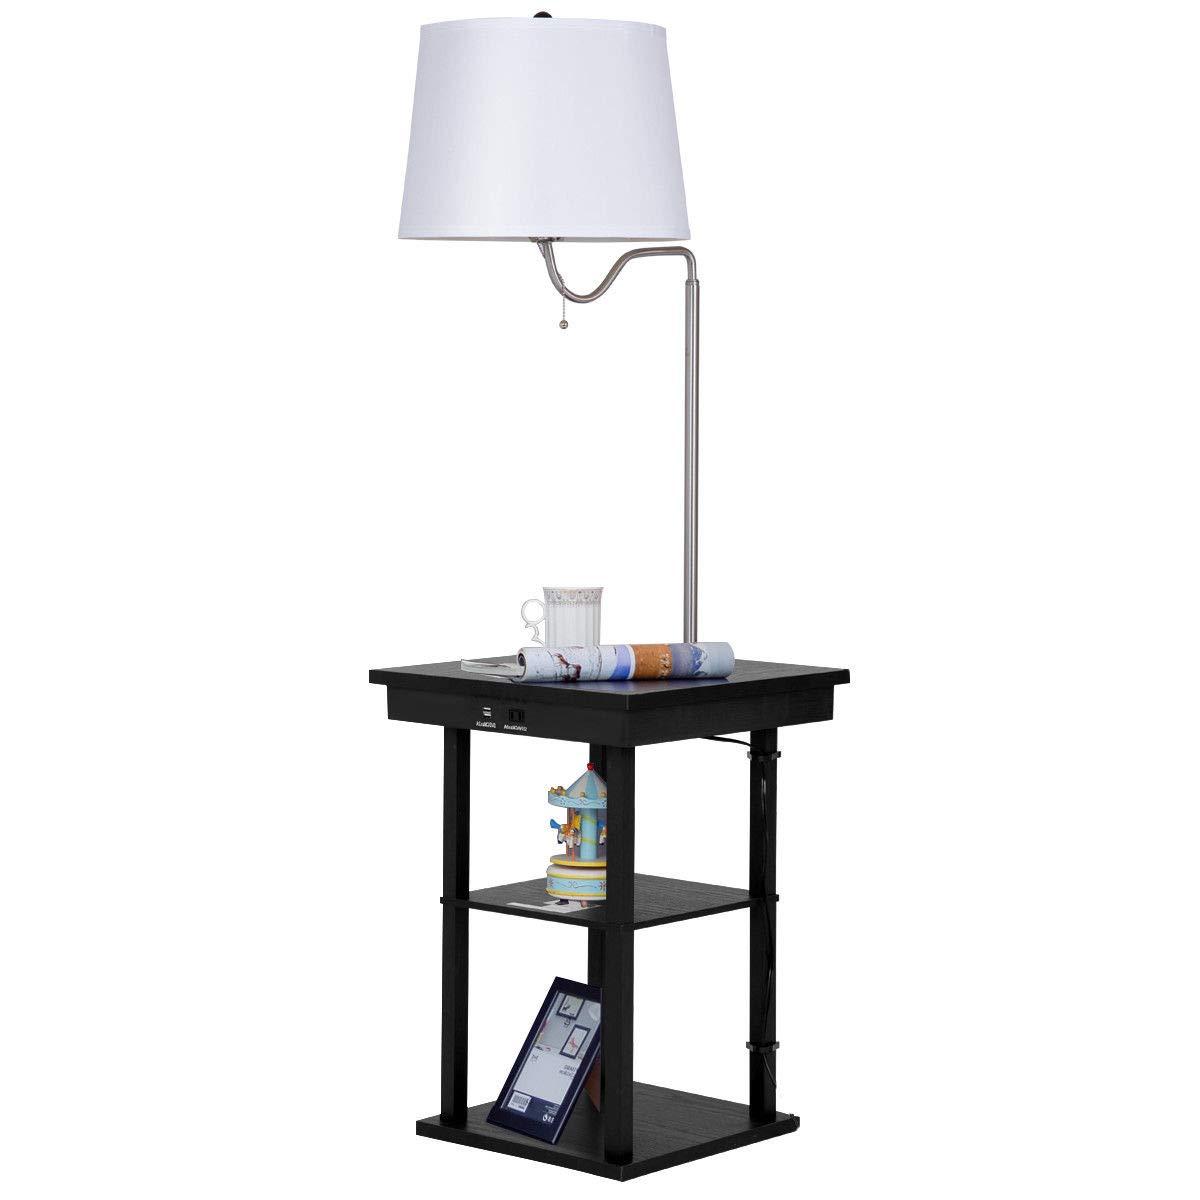 Amazon Com Thaisan7 Floor Lamp Swing Arm Lamp Built In End